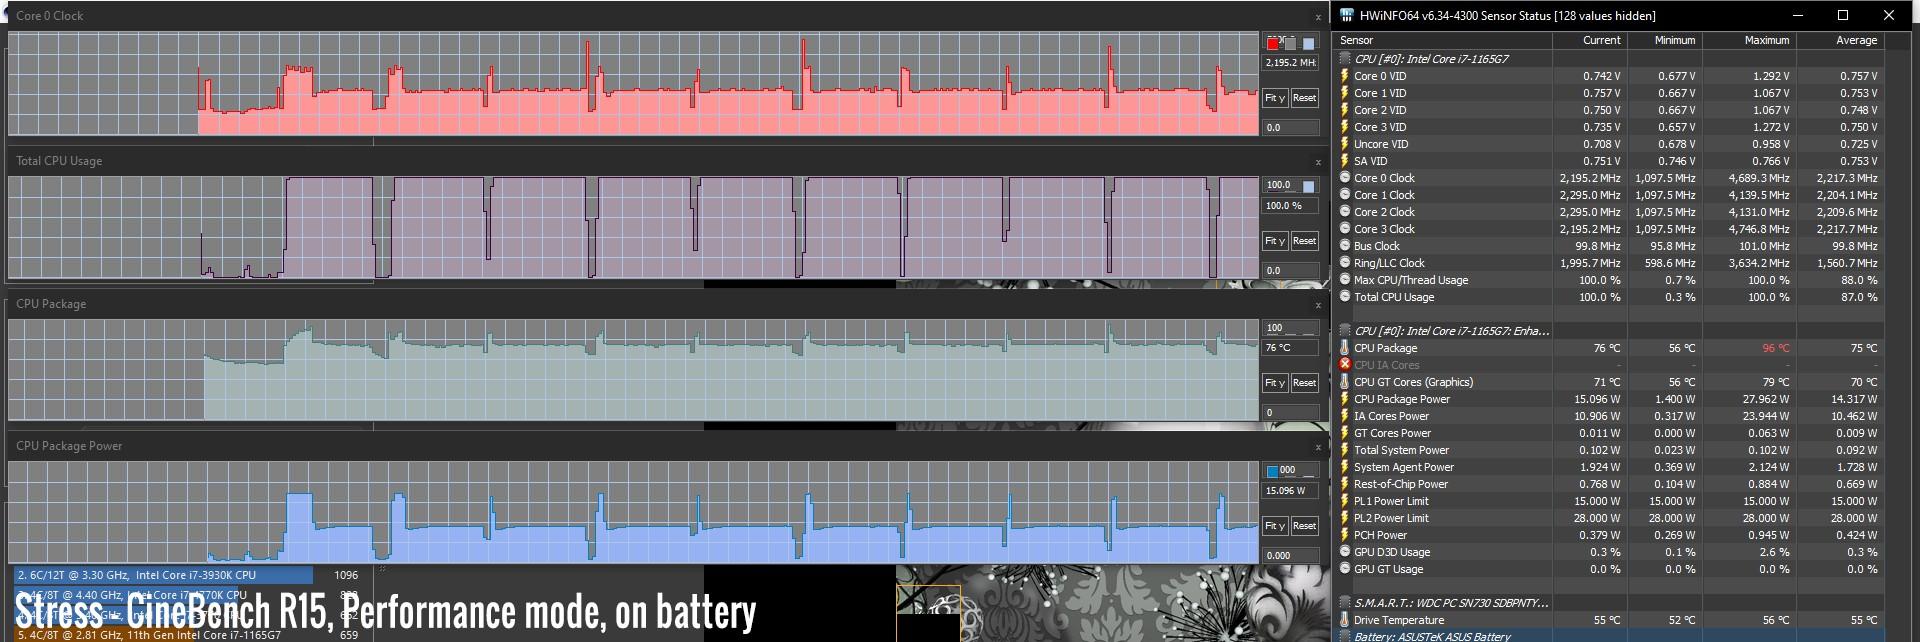 stress-cinebenchr15-perf-battery